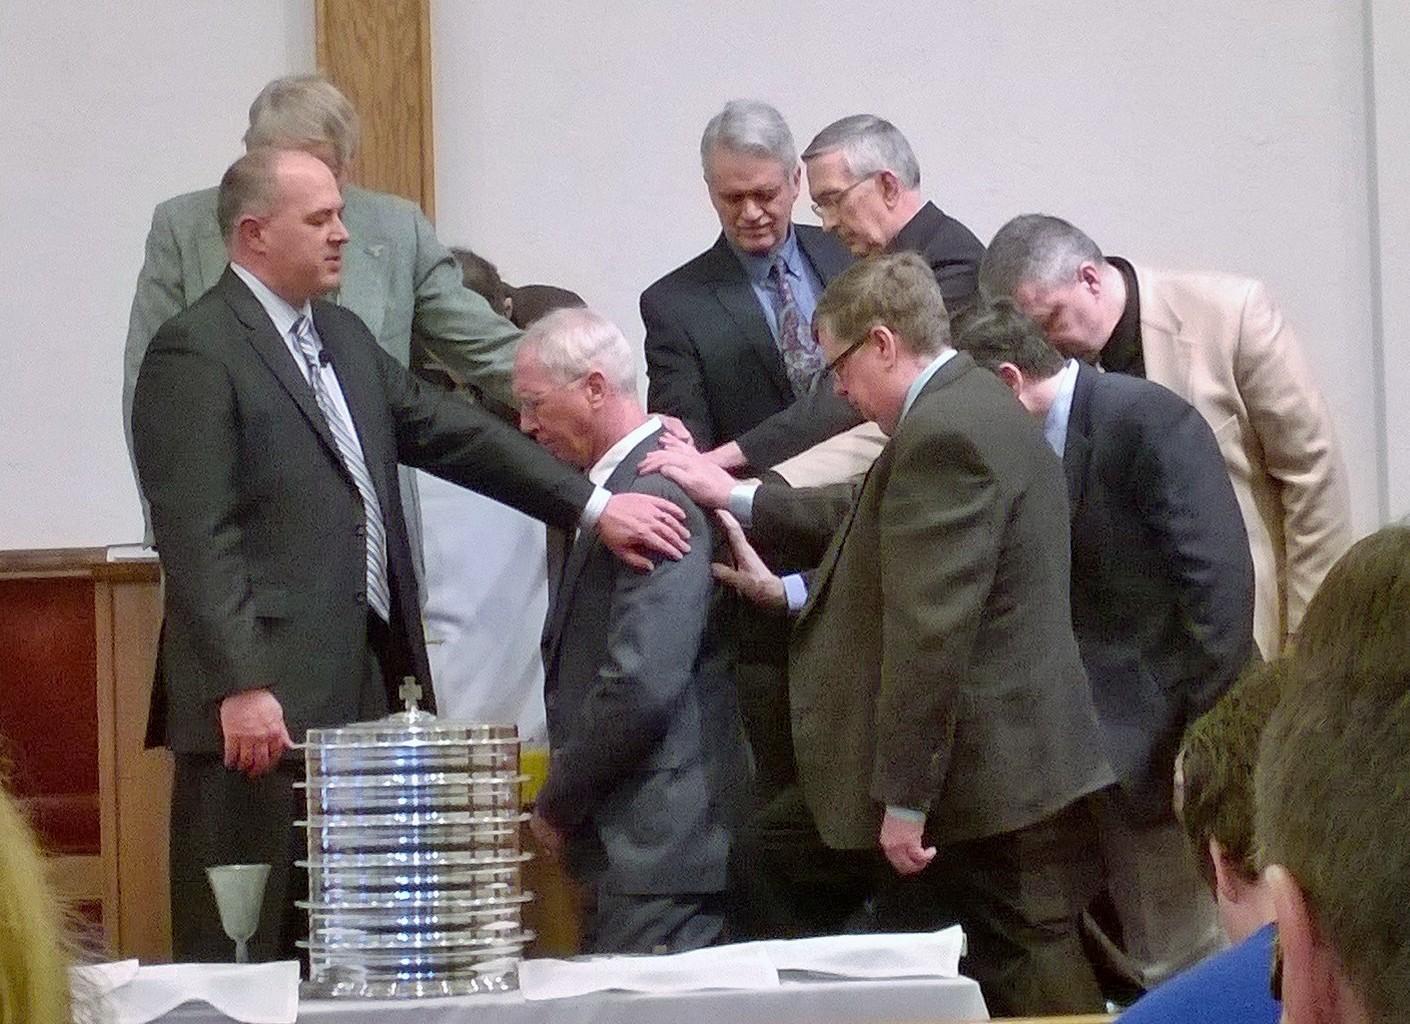 cc - Terry Claycomb ordination.jpg